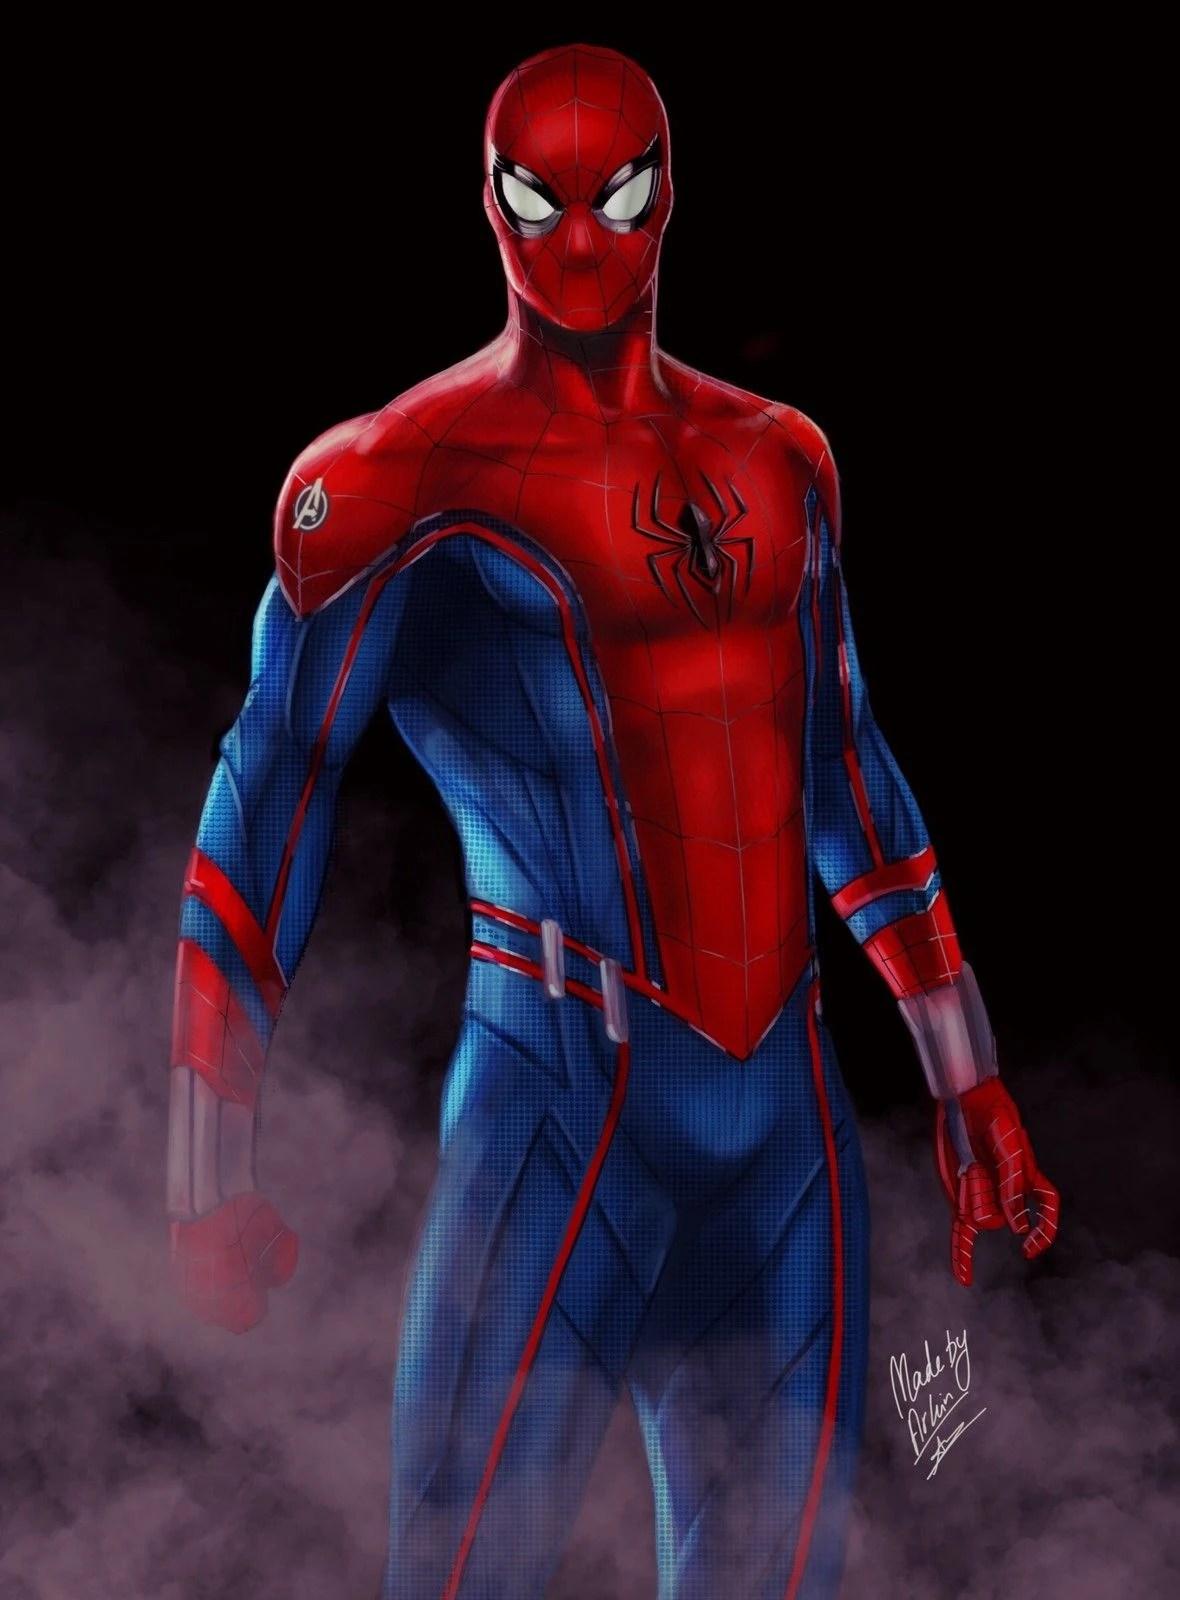 Spiderman Surrogate Father : spiderman, surrogate, father, Peter, Parker, (Earth-20000), Marvel, Fanon, Fandom